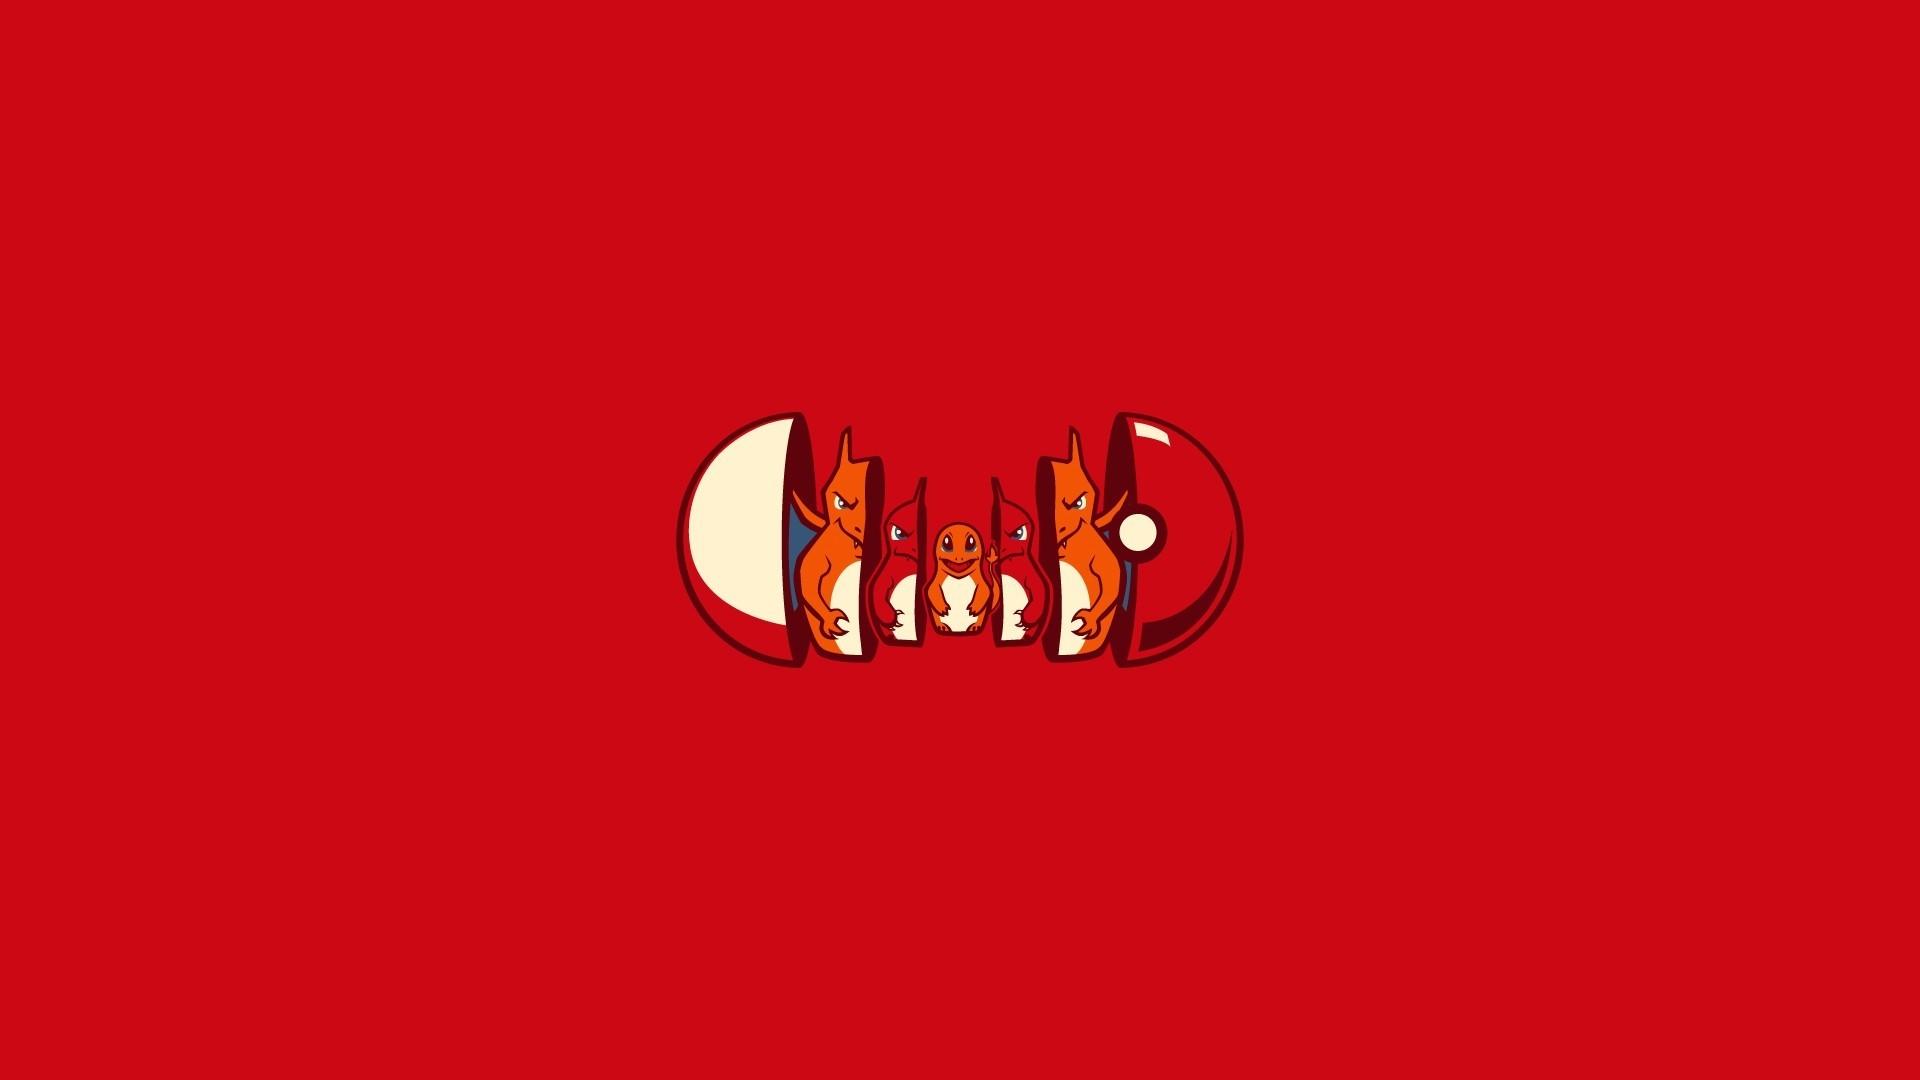 Ricardo Kaka Hd Wallpapers Pokeball Background Choice Image Wallpaper And Free Download